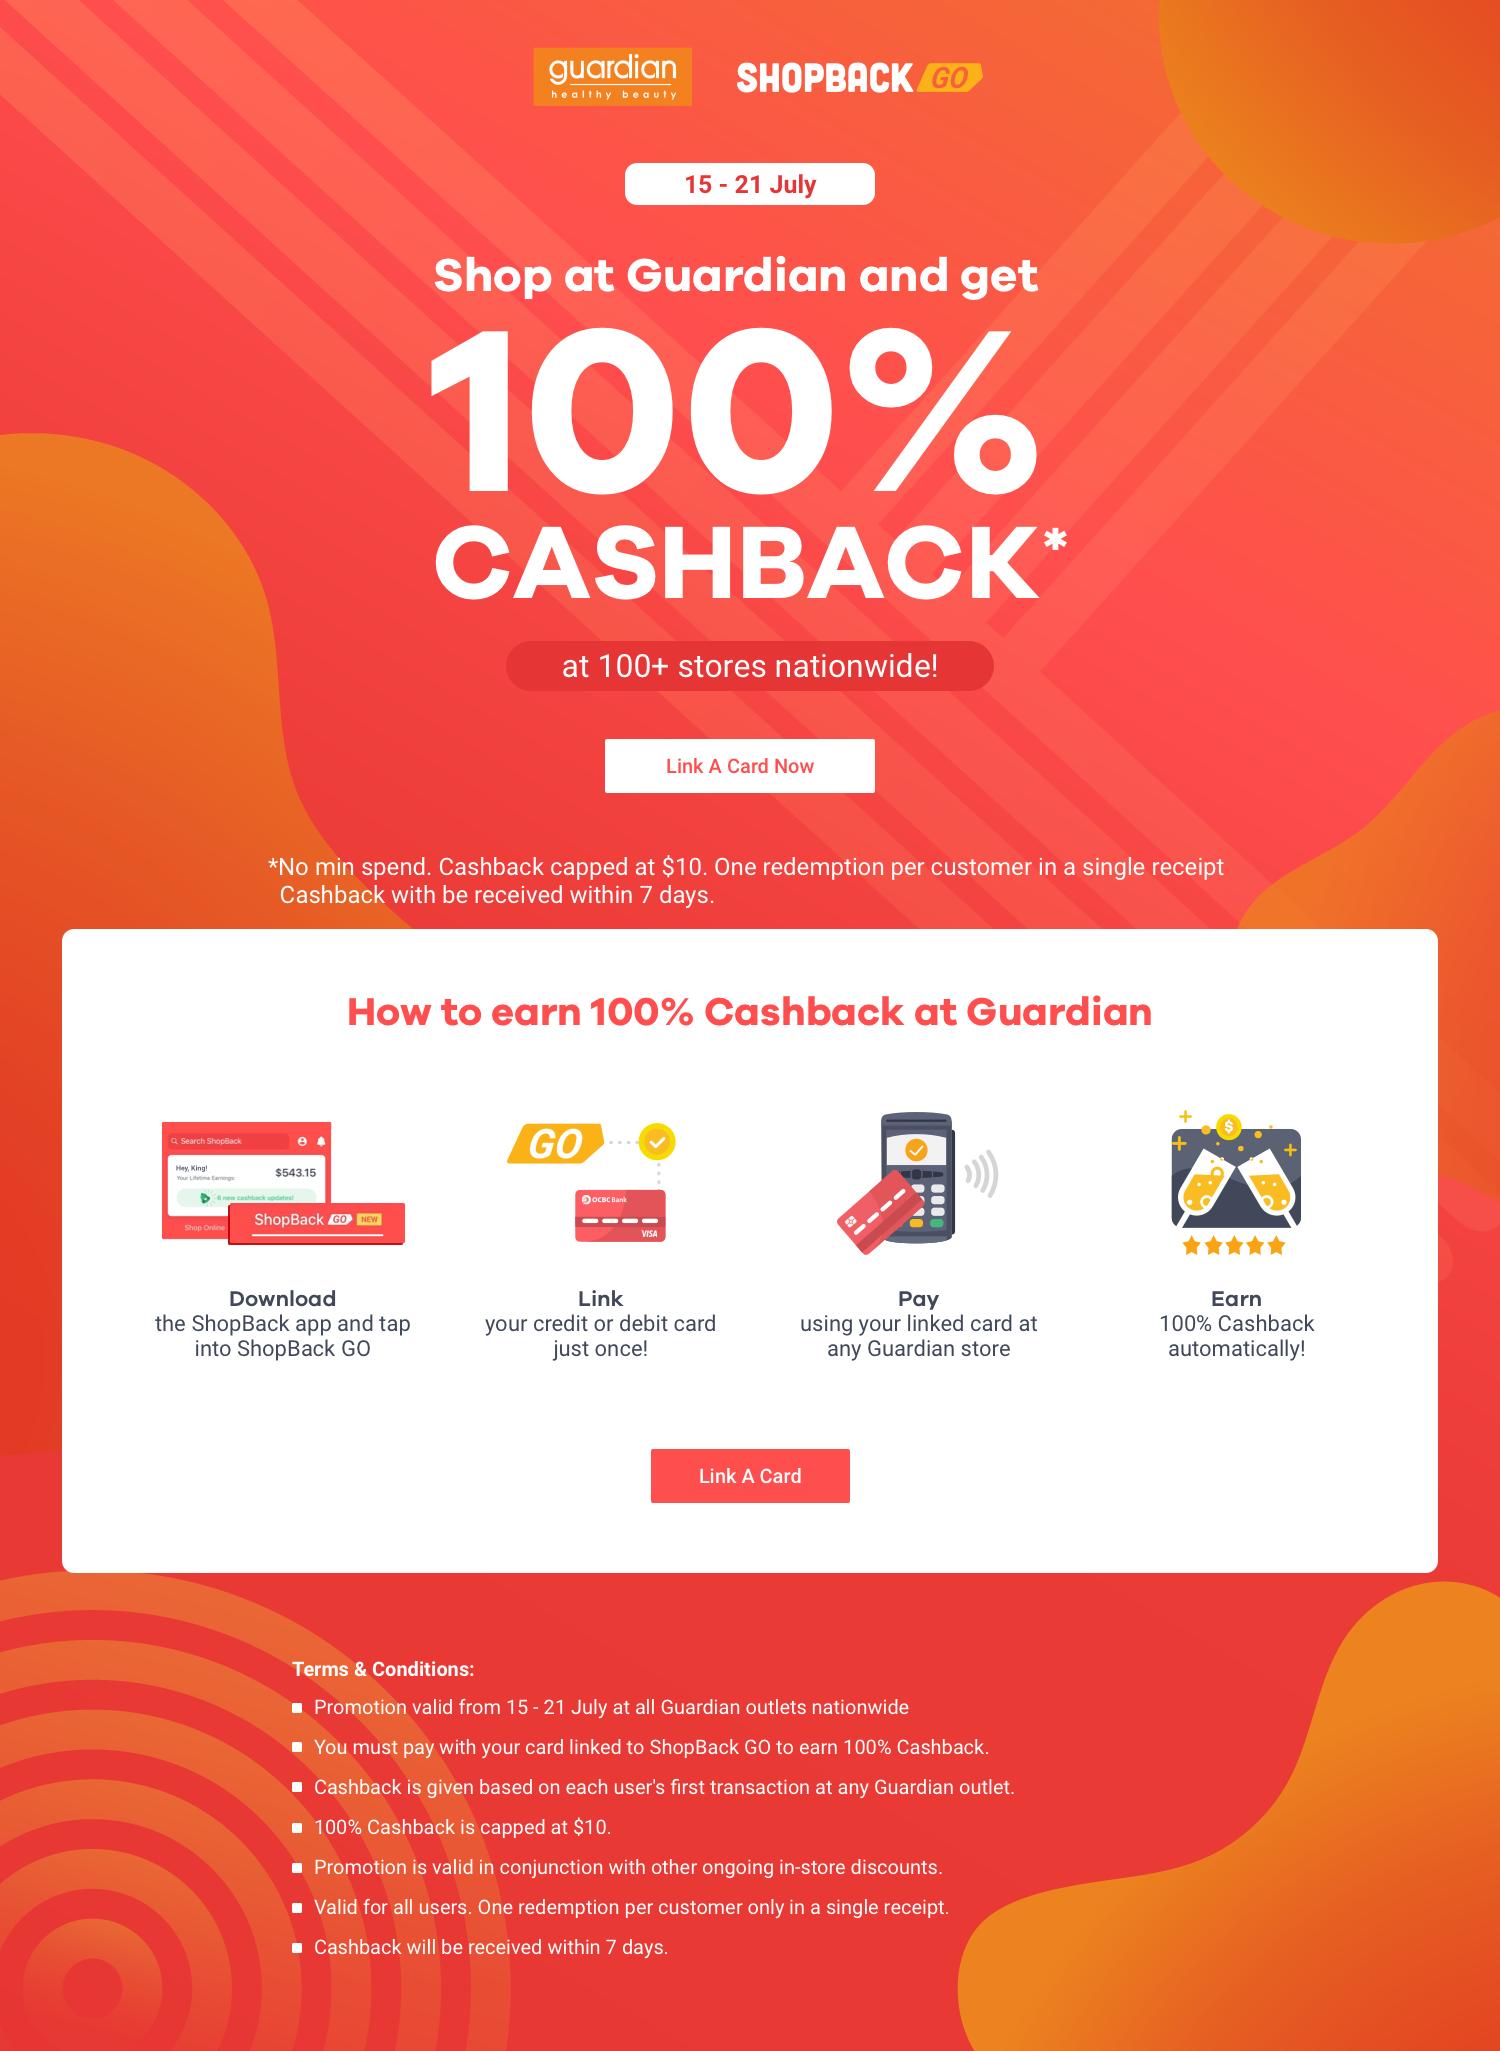 ShopBack GO x Guardian: 100% Cashback*